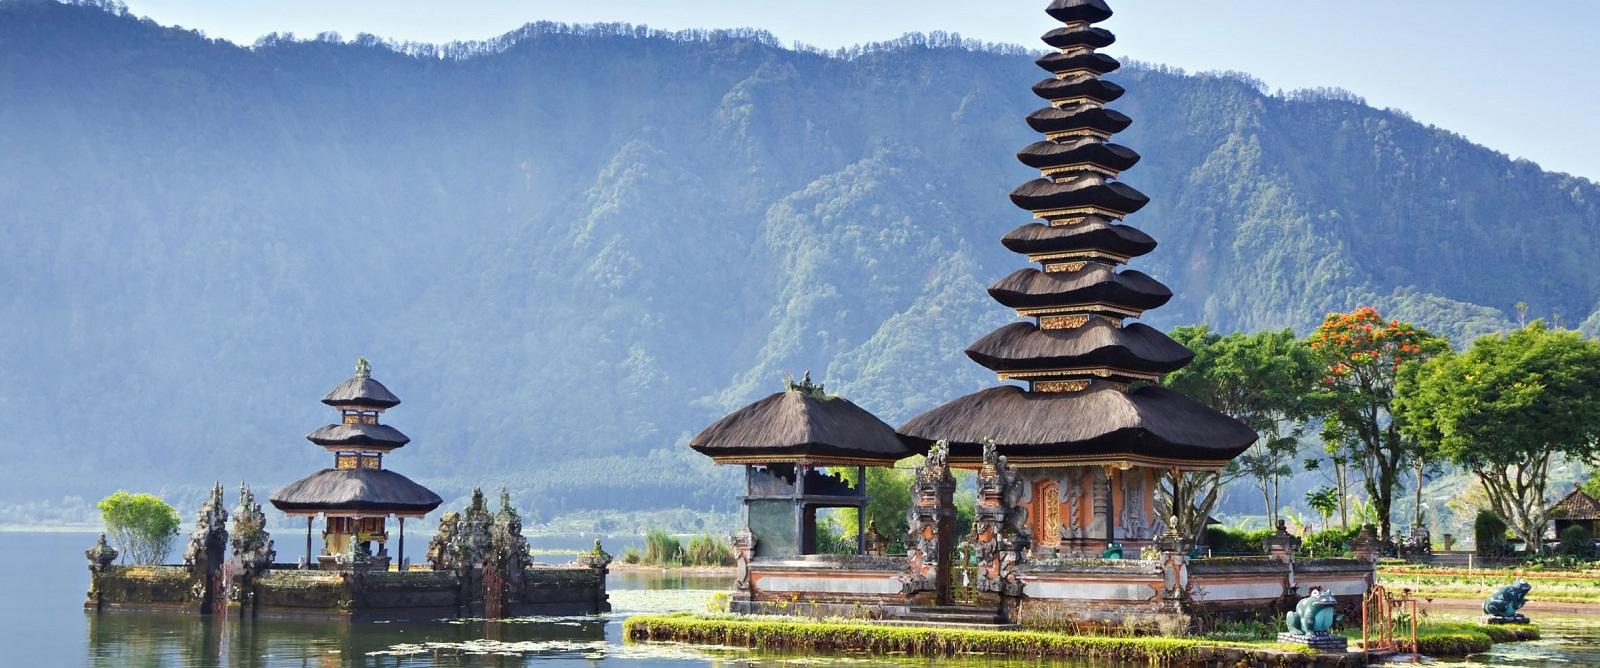 Bali-Temple1